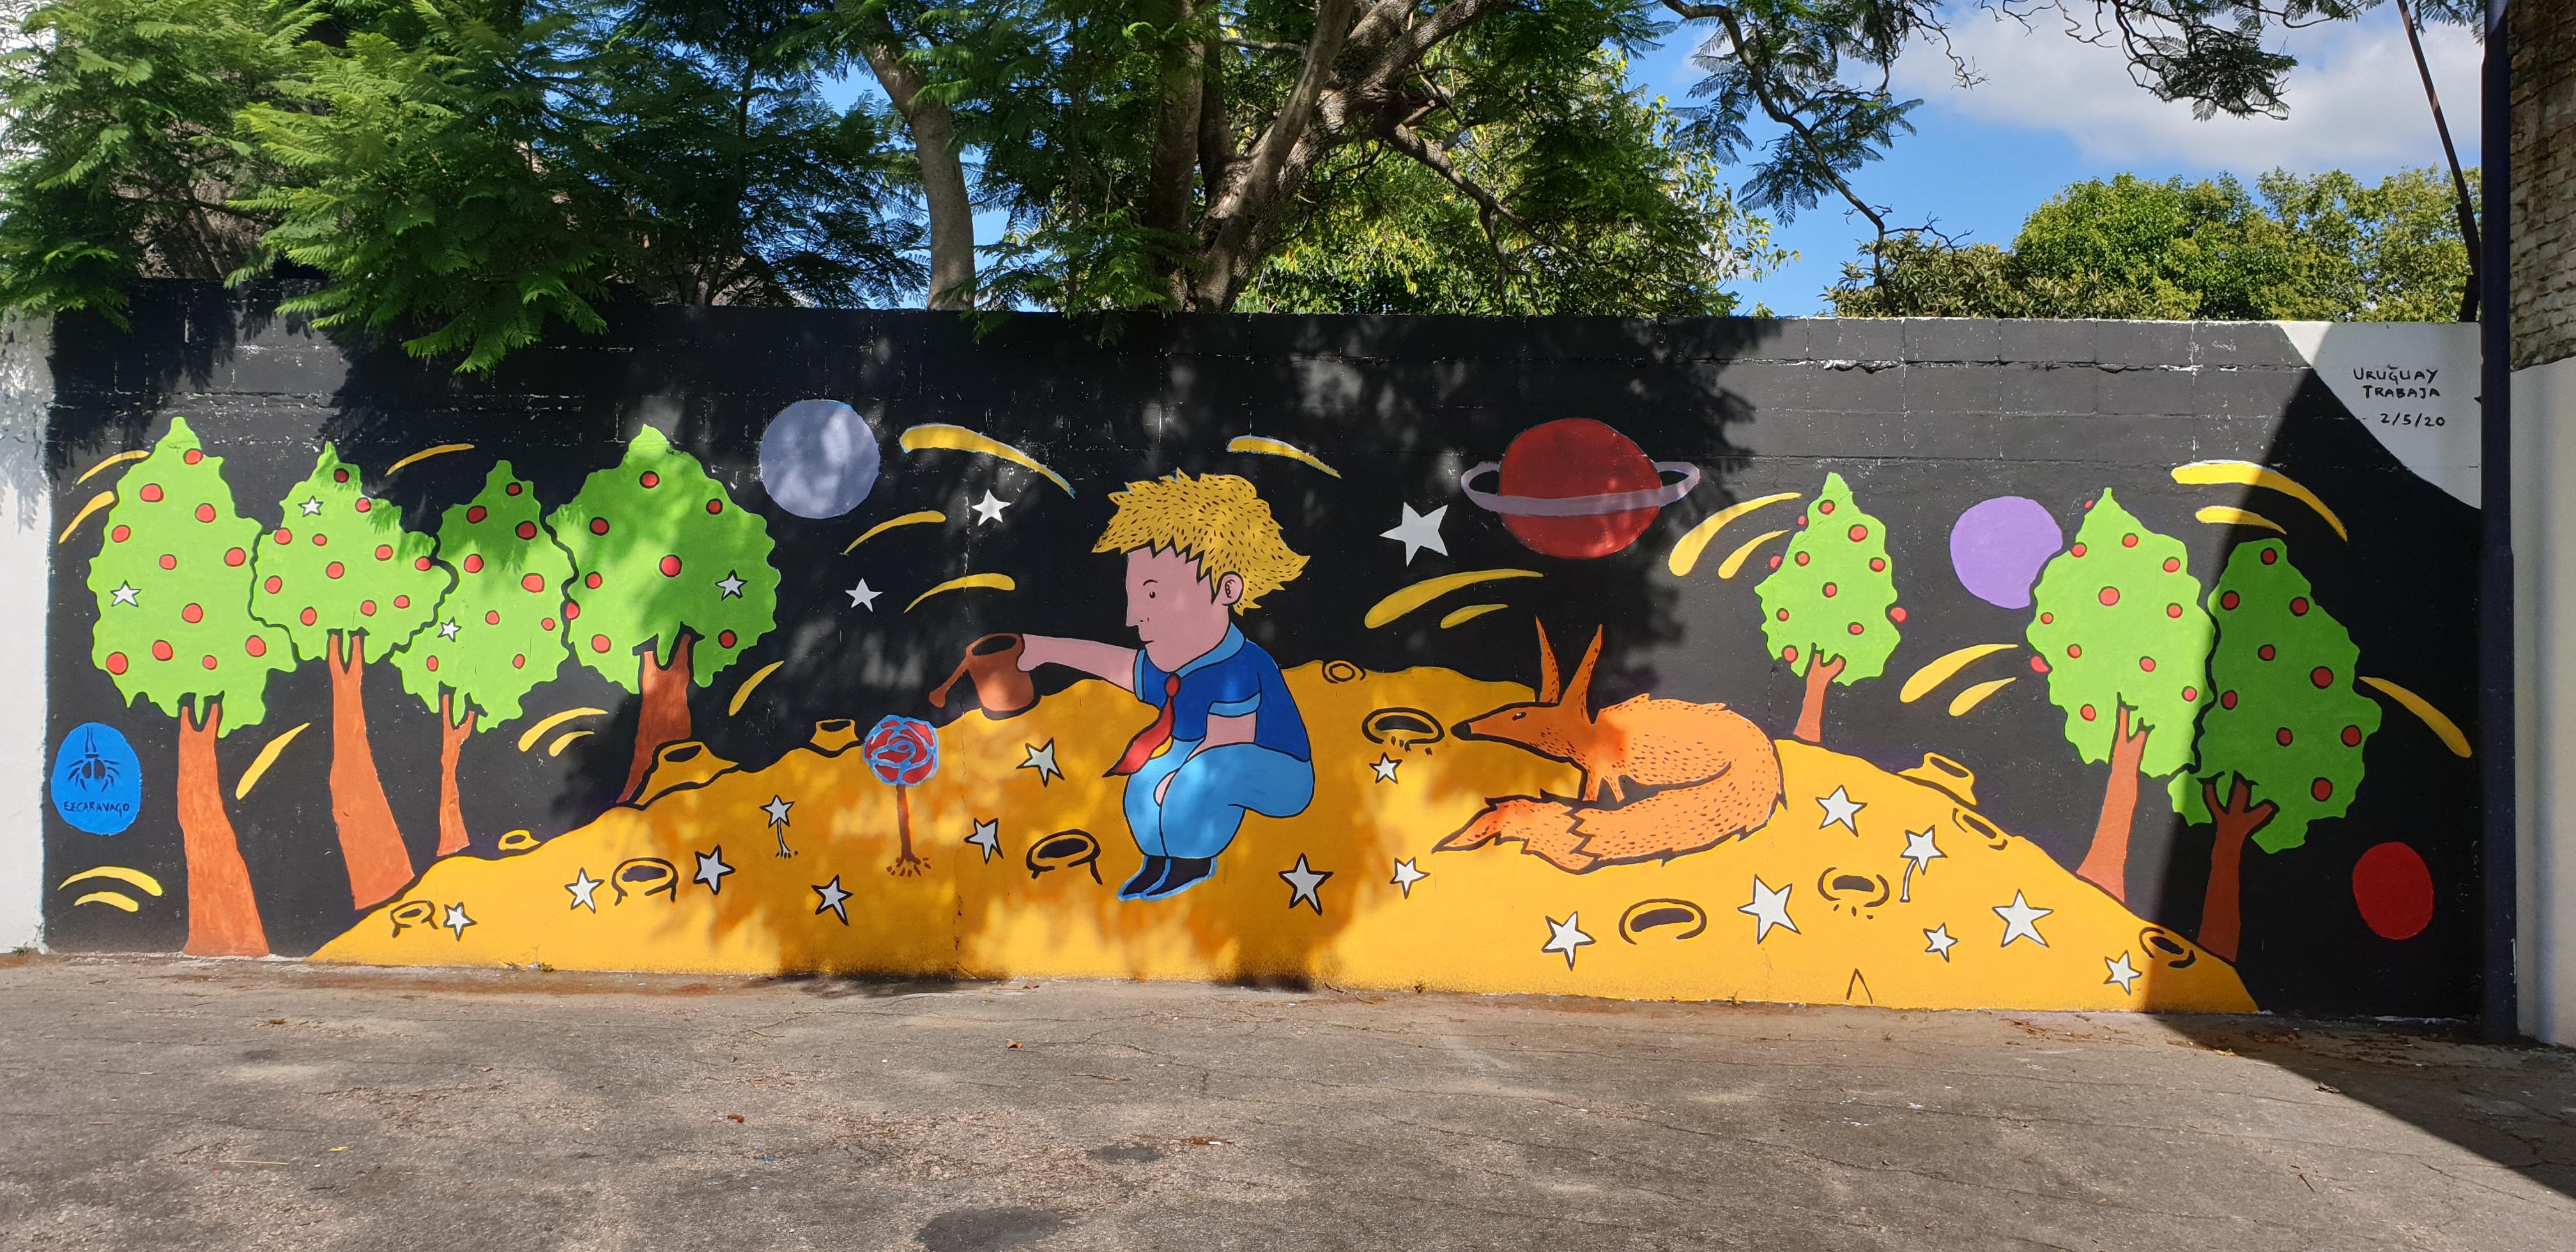 Mur réalisé par Nicolas Rodriguez - Durazno - Uruguay 2020 - ©nofakeinmynews.com